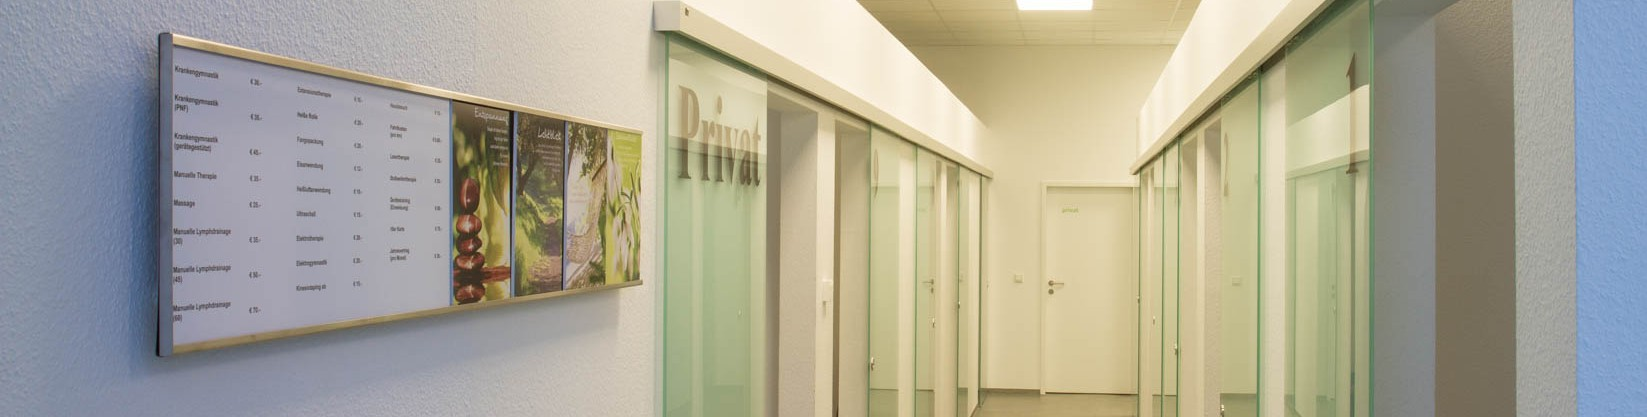 Janson Praxis GmbH